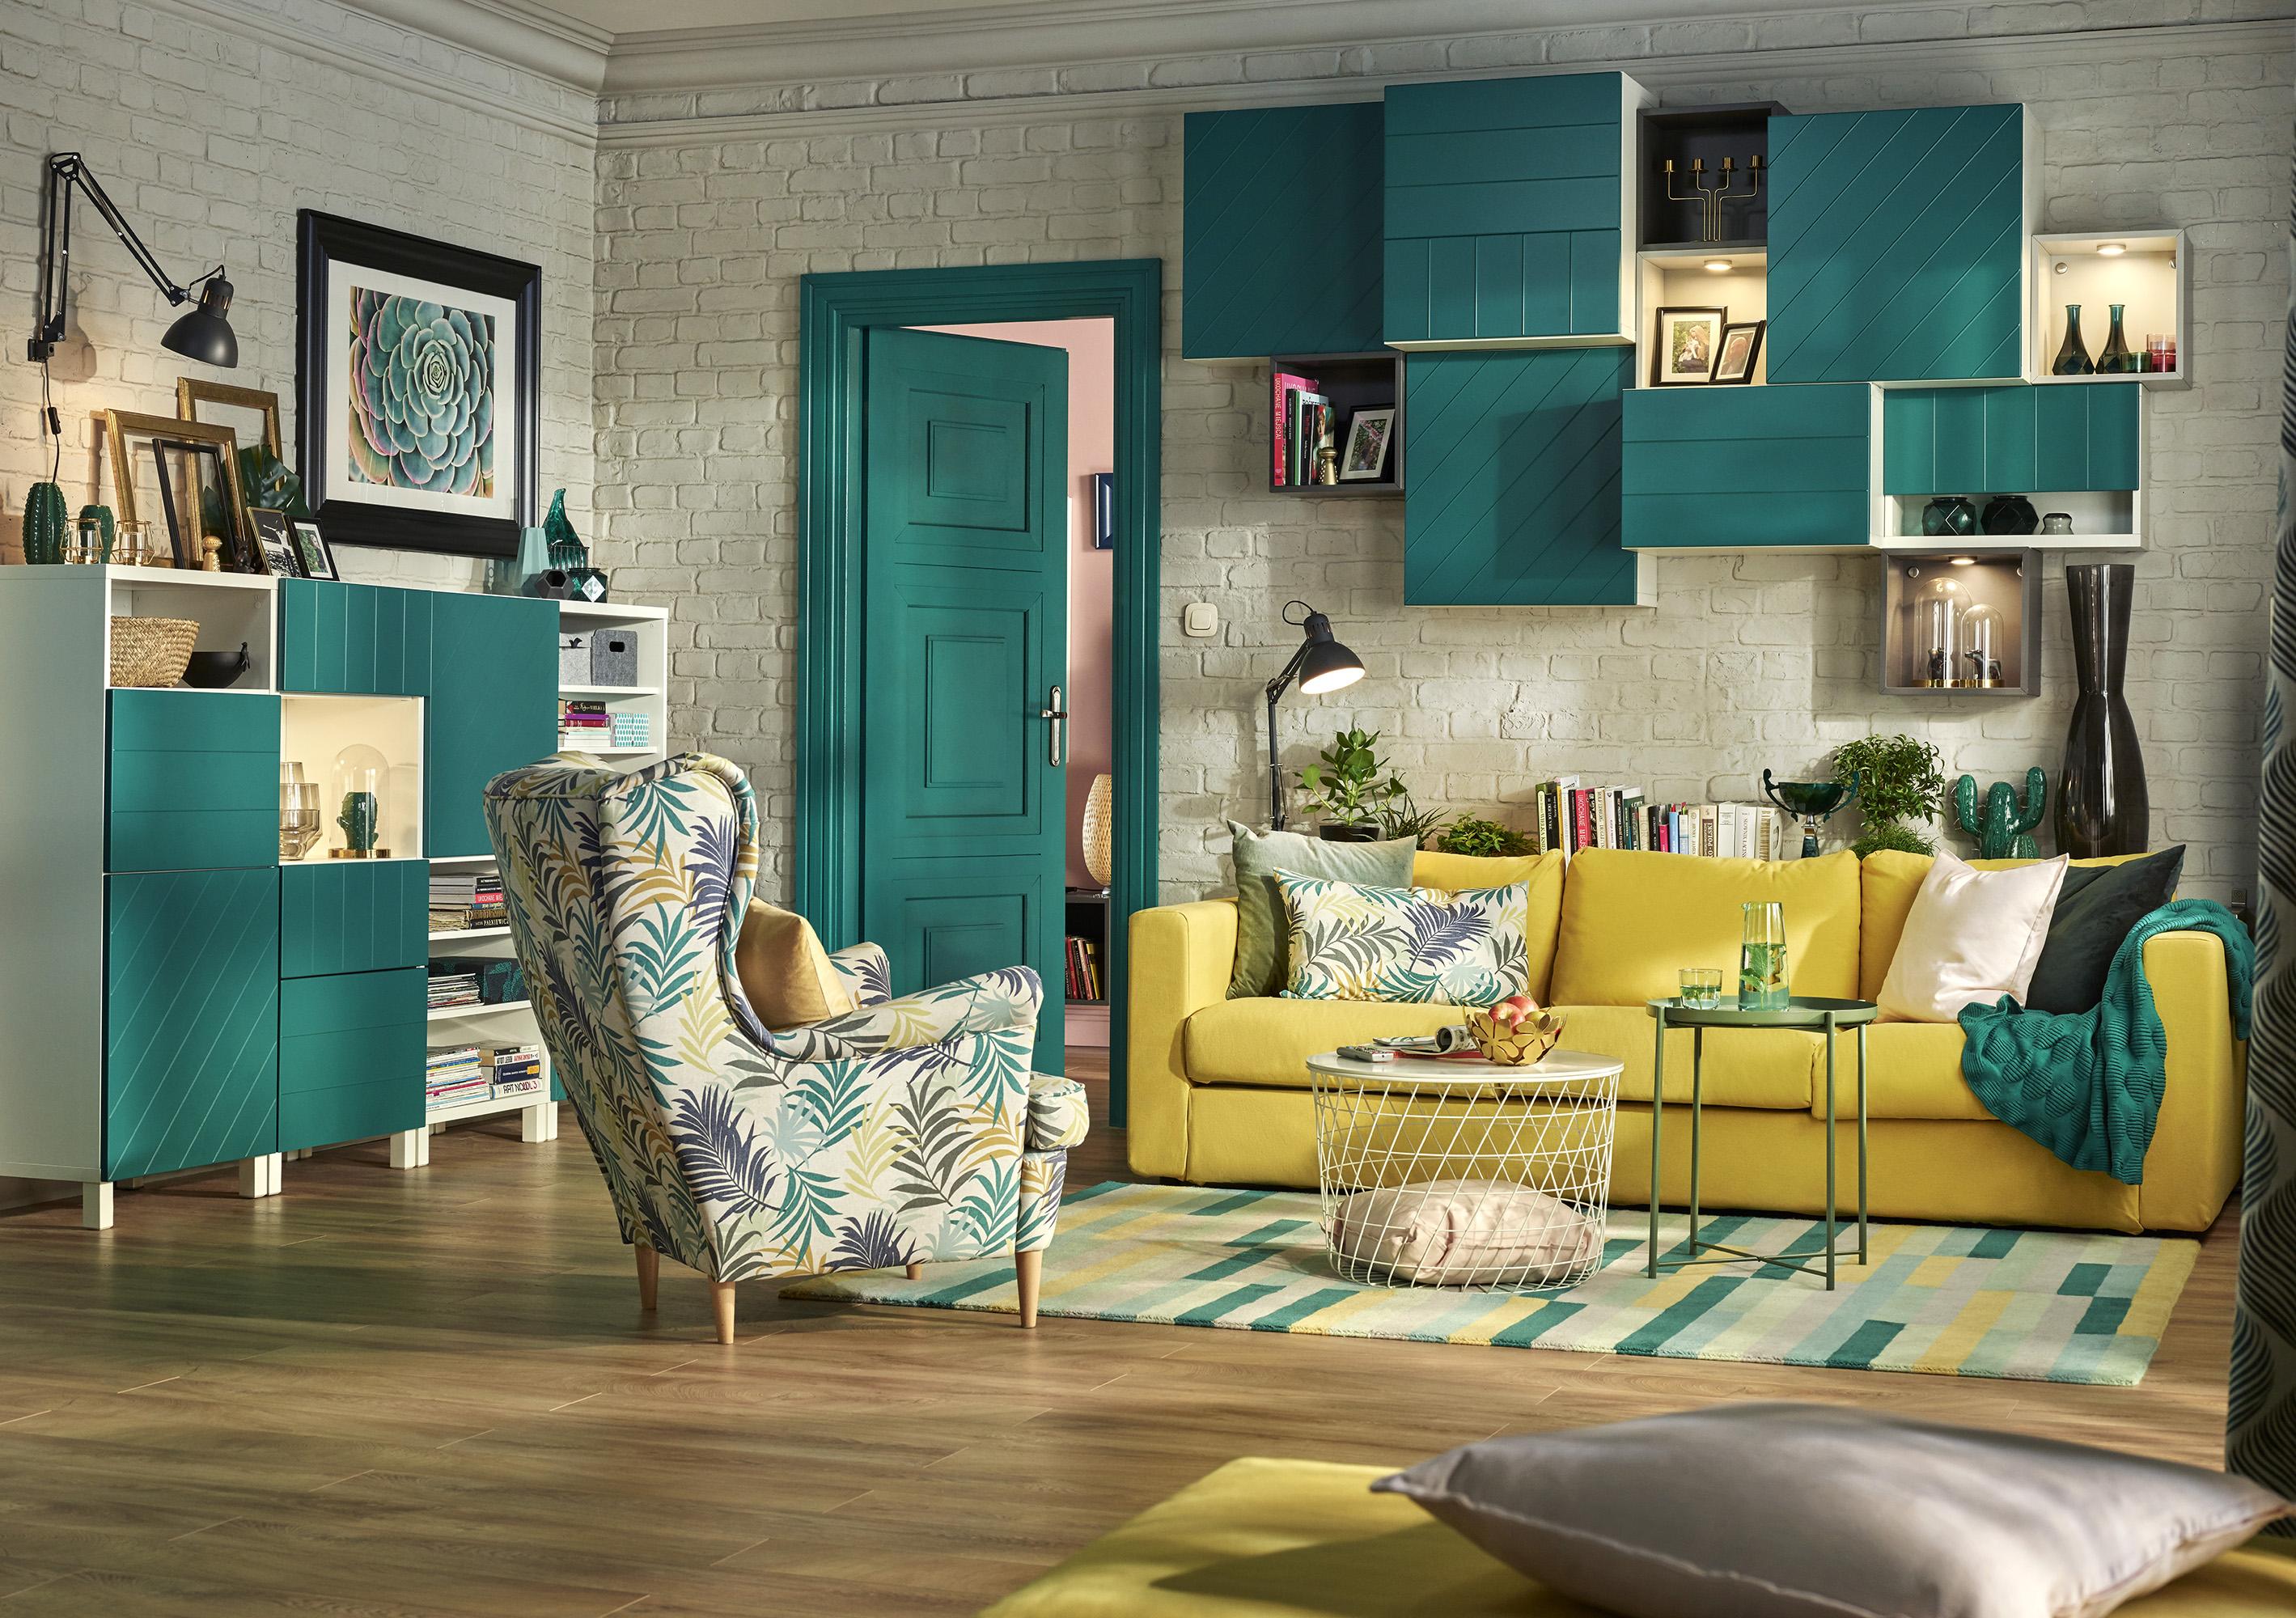 nowy katalog ikea 2018 zdj cia. Black Bedroom Furniture Sets. Home Design Ideas